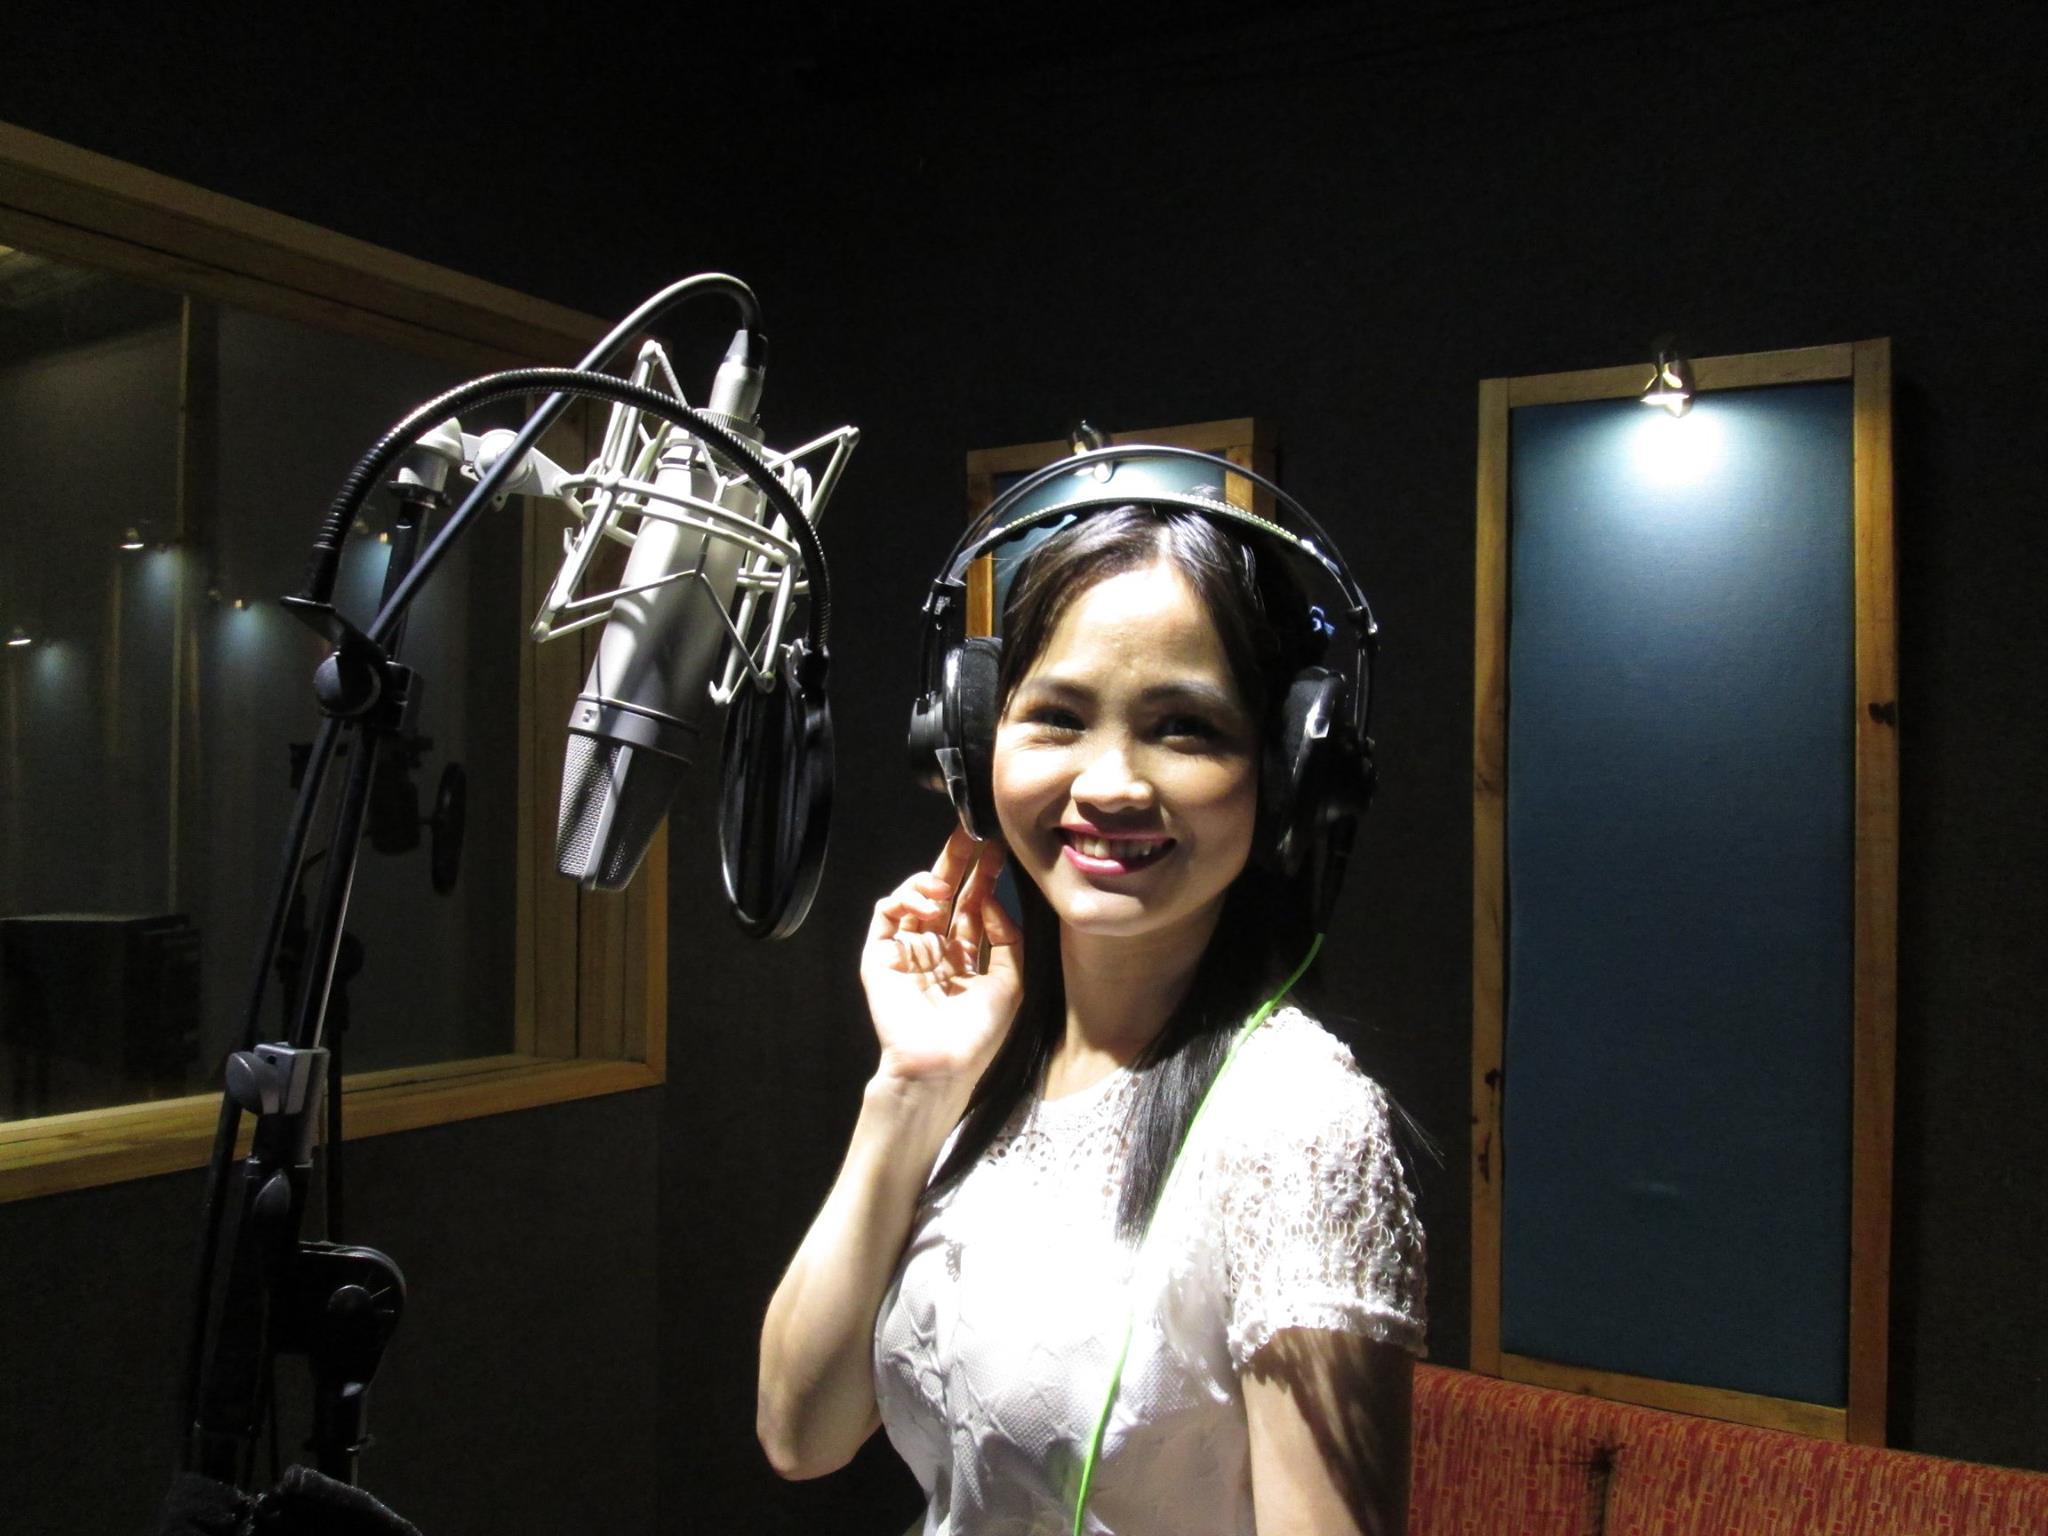 Vietnamese voice over